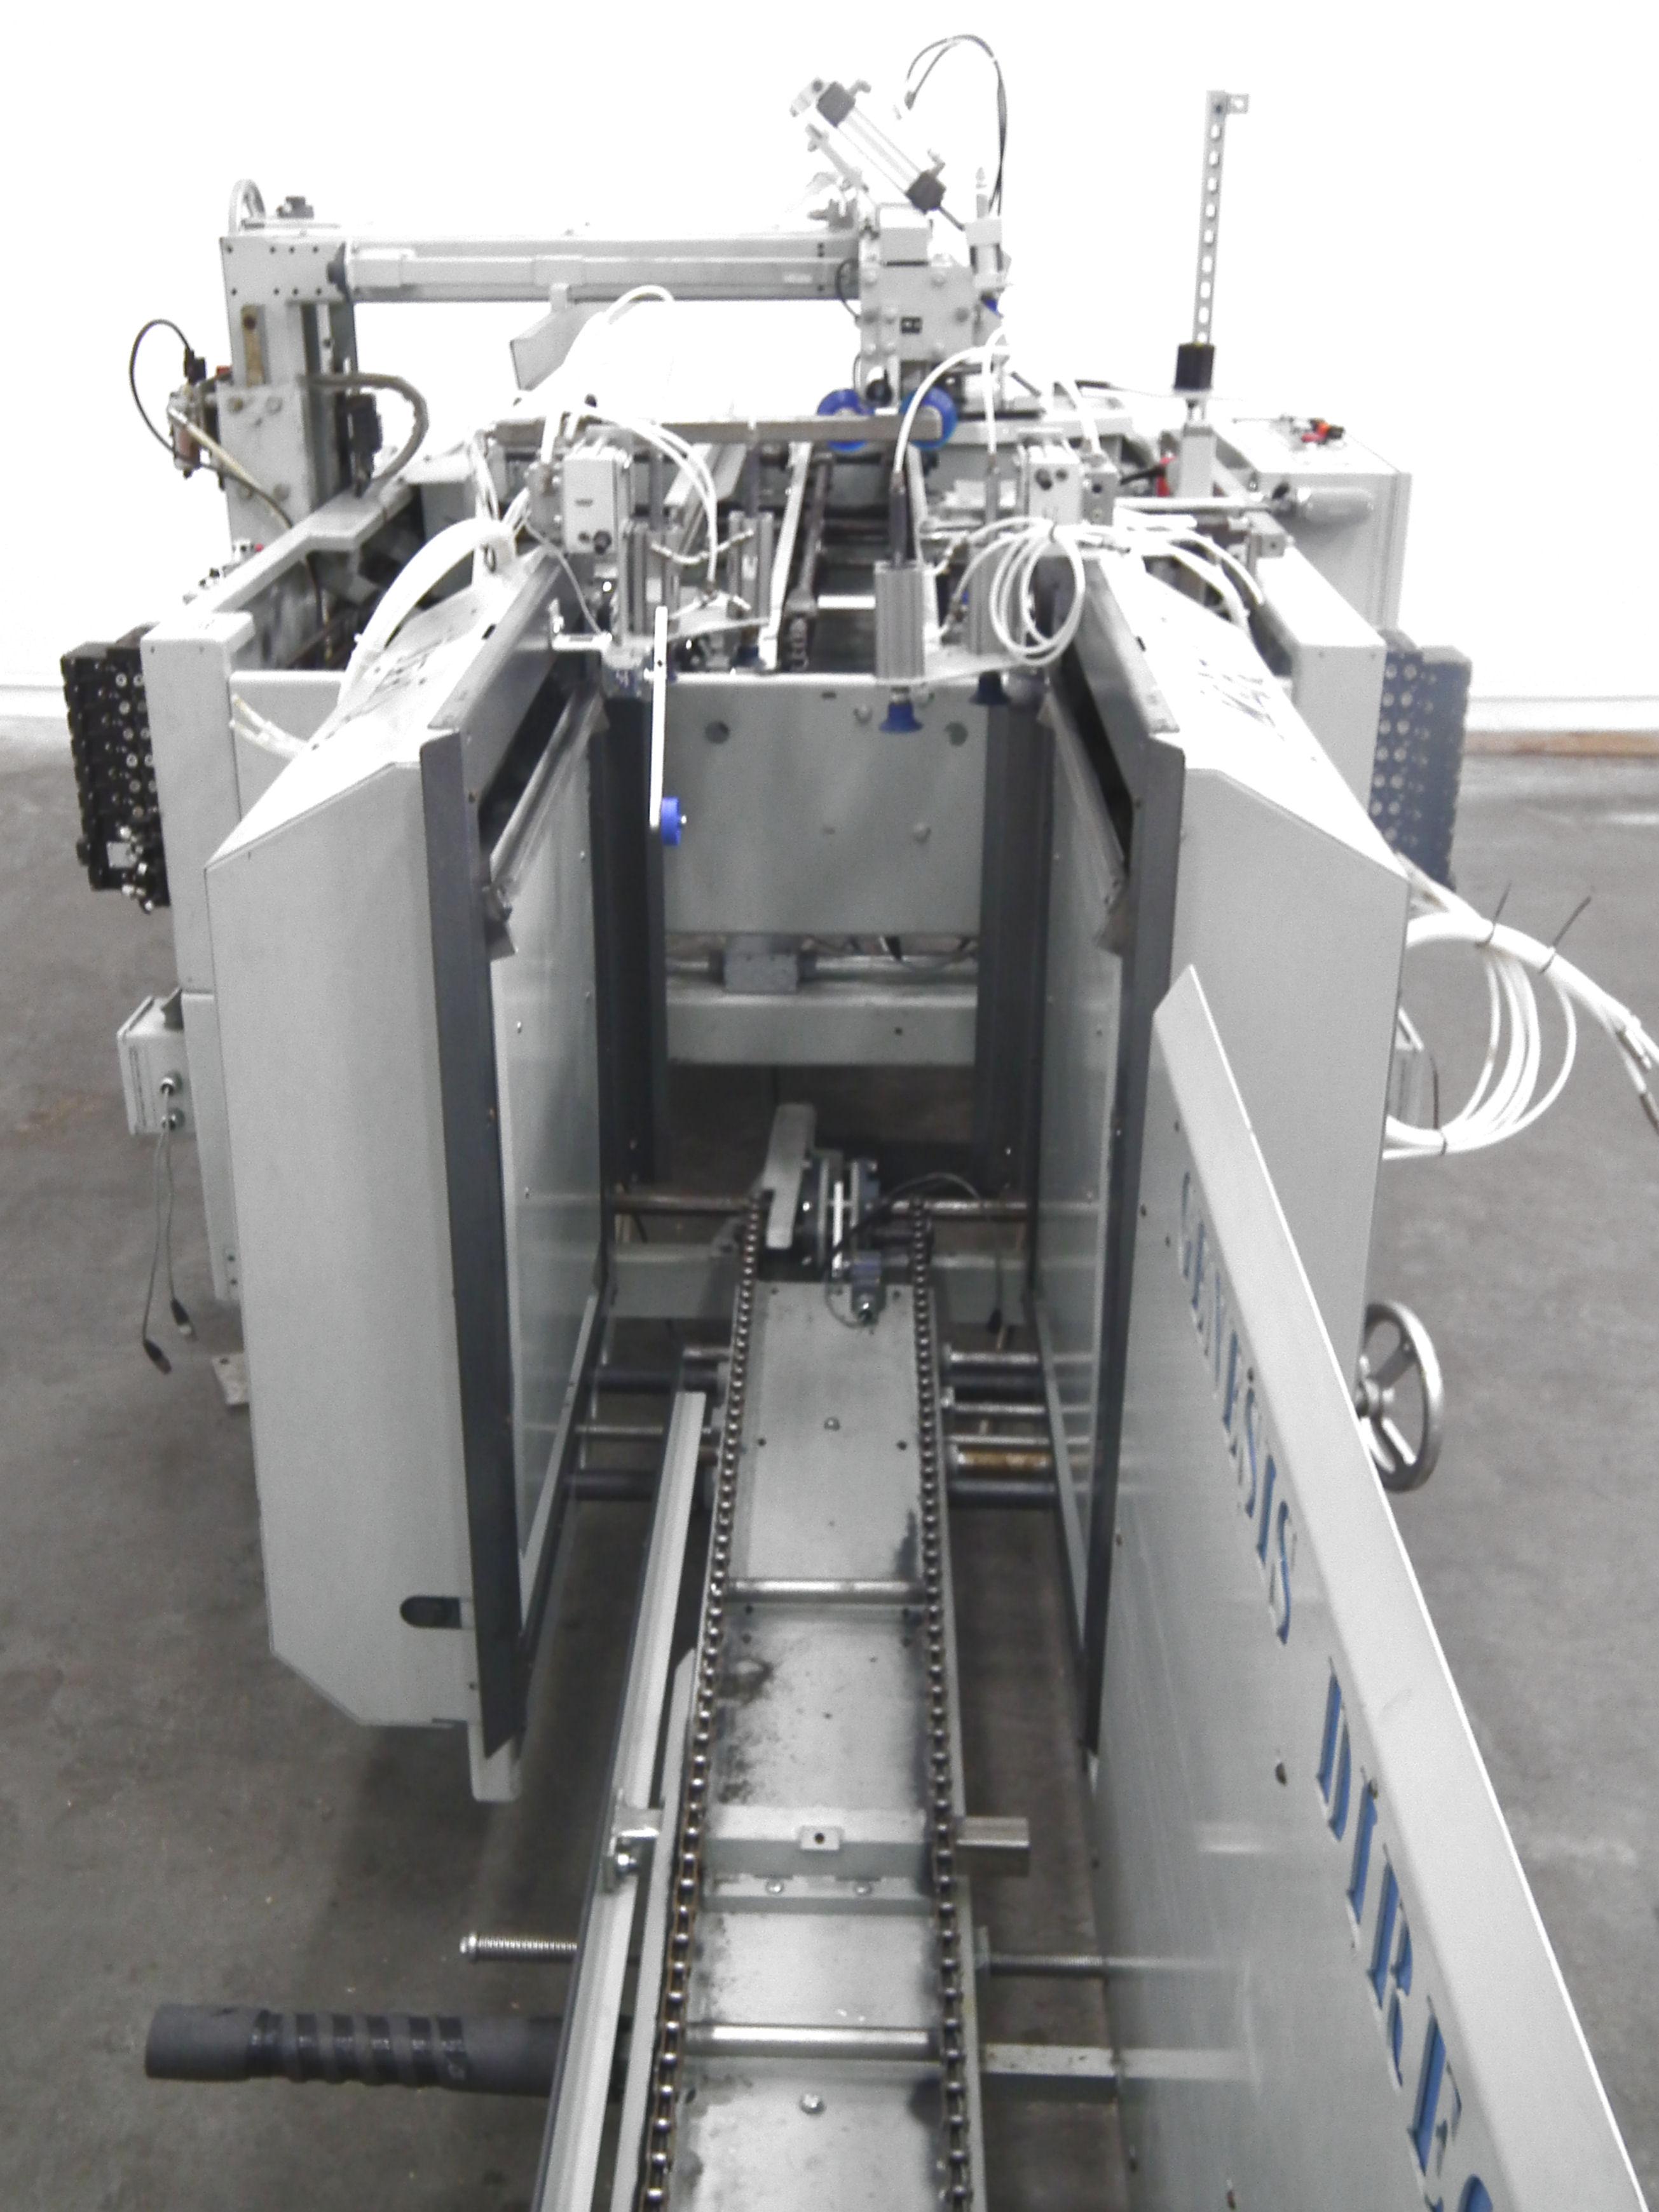 Marq Tuff HPE-NS-MF/RH/DL Bottom Tape Case Erector A9697 - Image 4 of 15